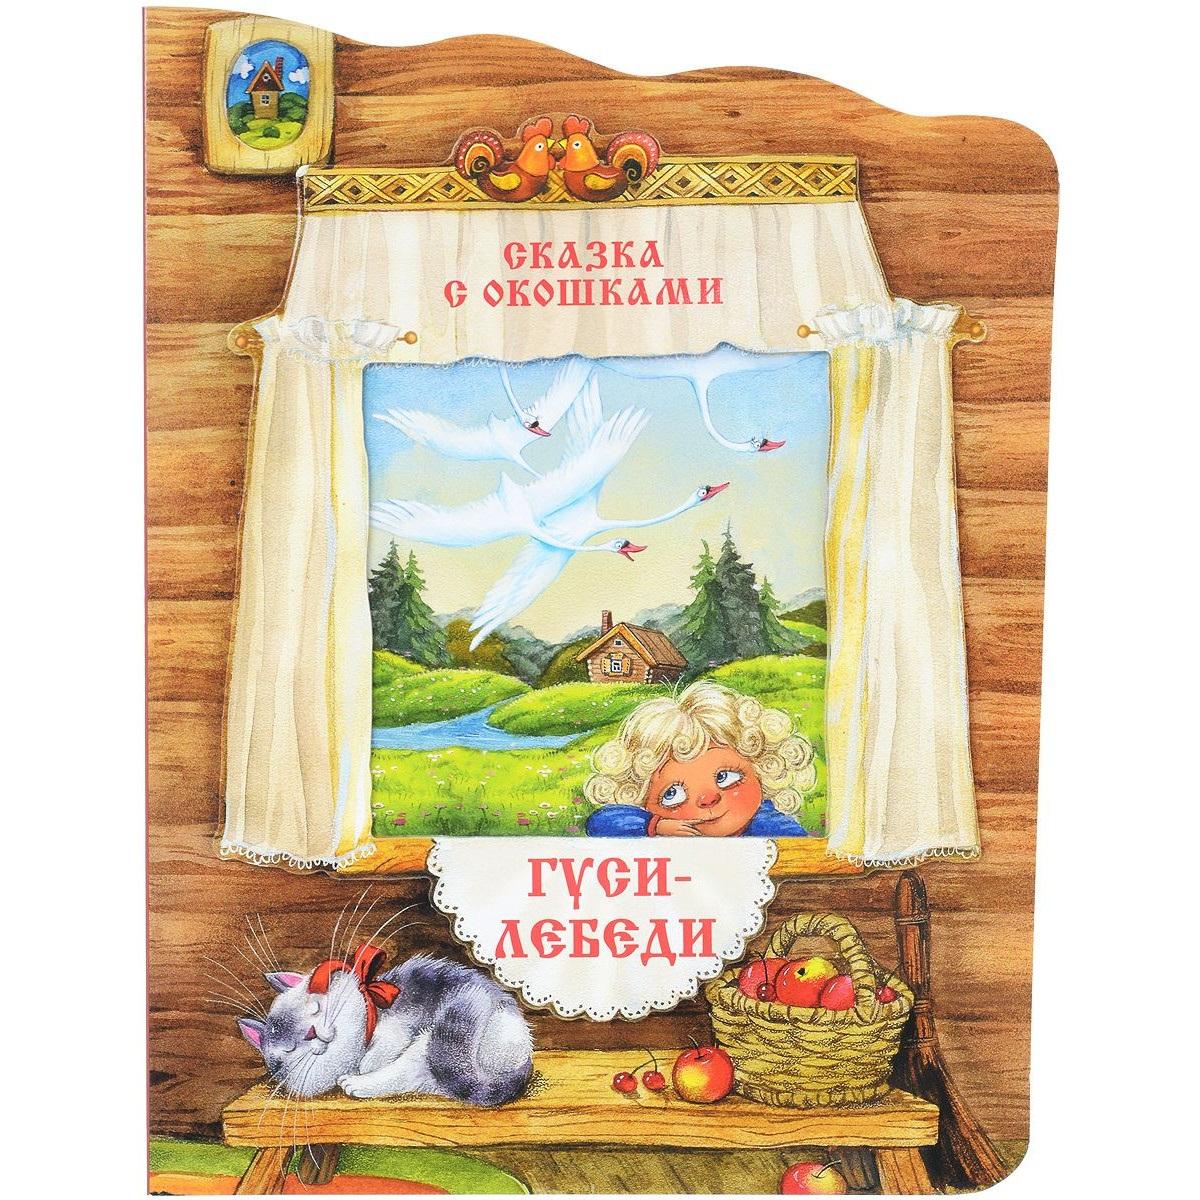 Сказка с окошками - Гуси-лебедиБибилиотека детского сада<br>Сказка с окошками - Гуси-лебеди<br>